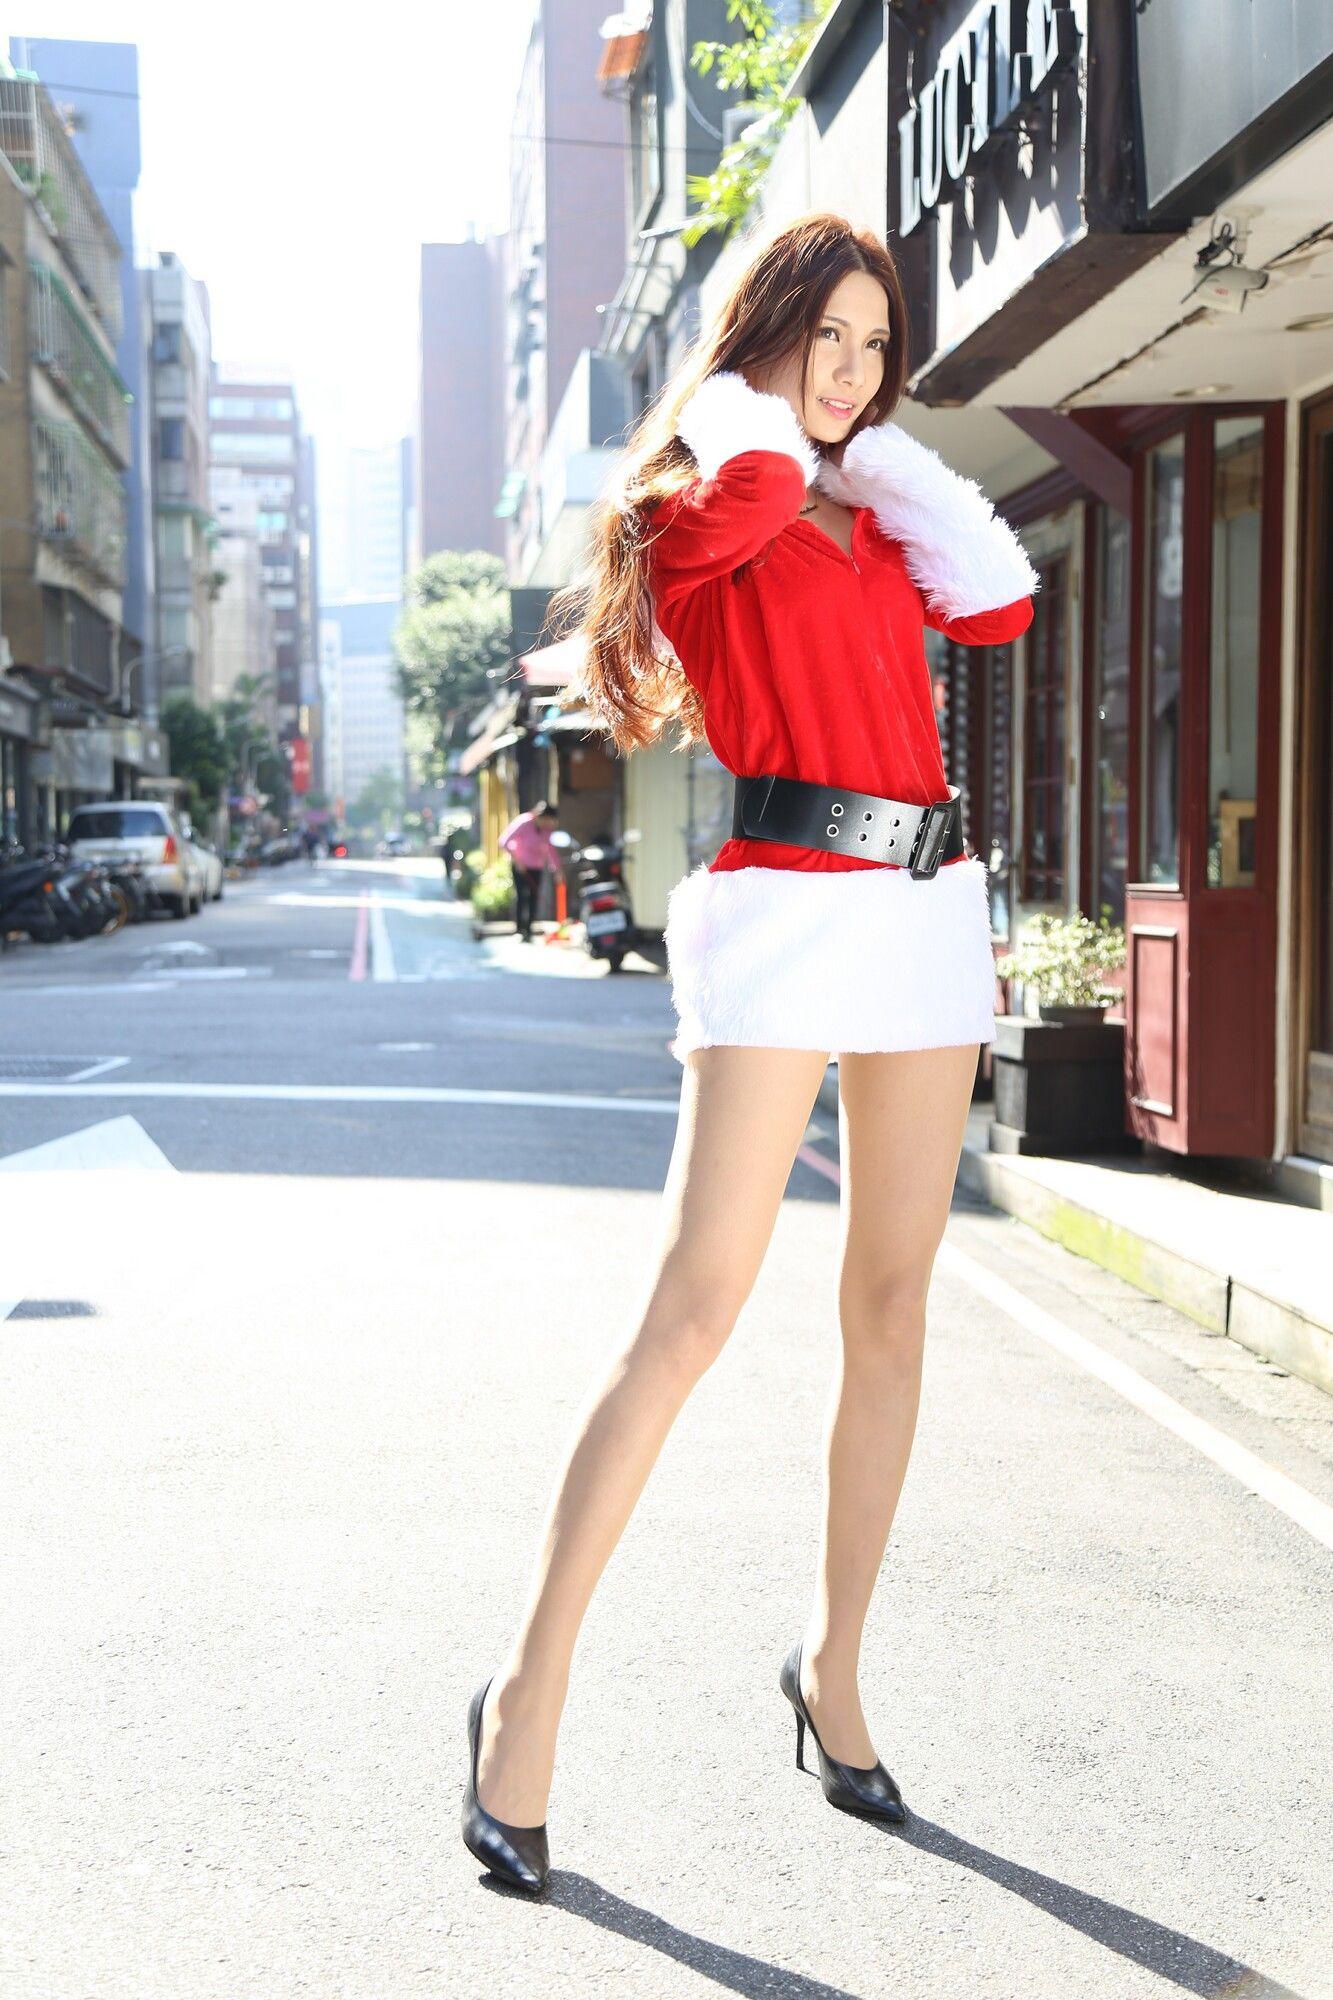 VOL.1111 [台湾正妹]圣诞街拍长腿美女:蔡译心(Candice)超高清个人性感漂亮大图(100P)